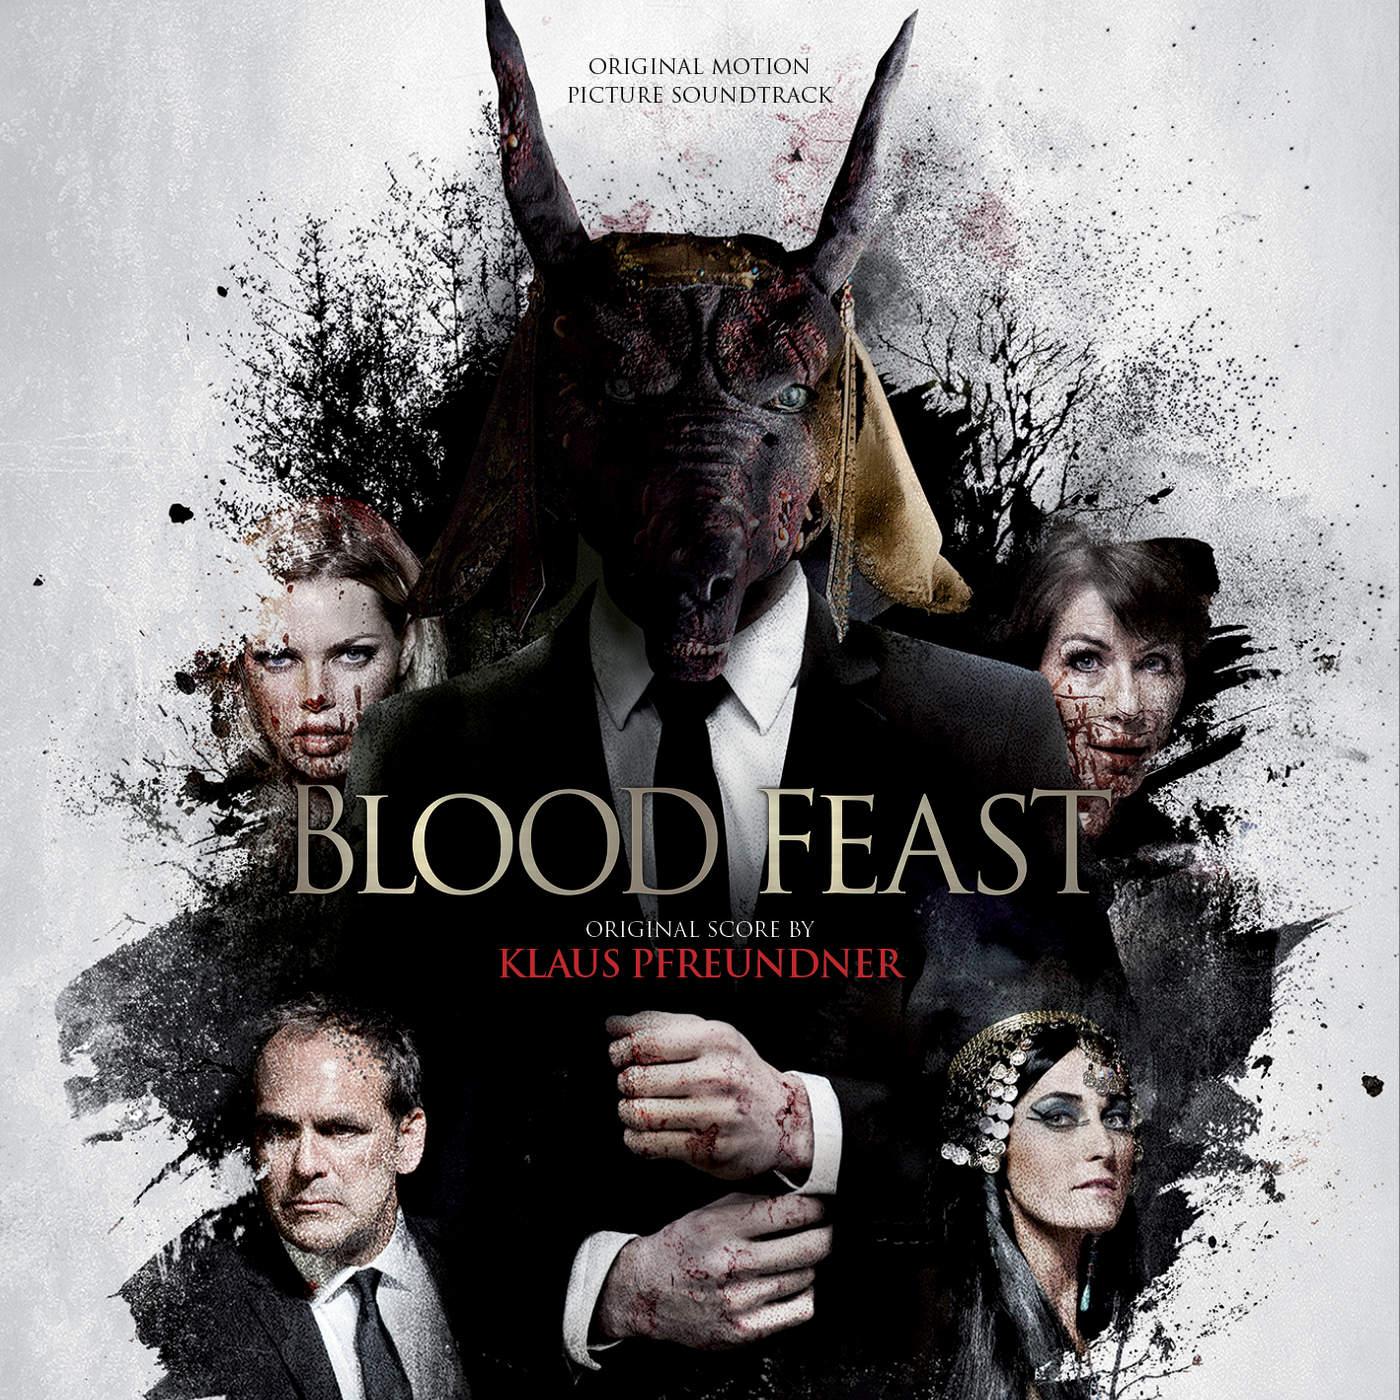 Blood Feast (Original Motion Picture